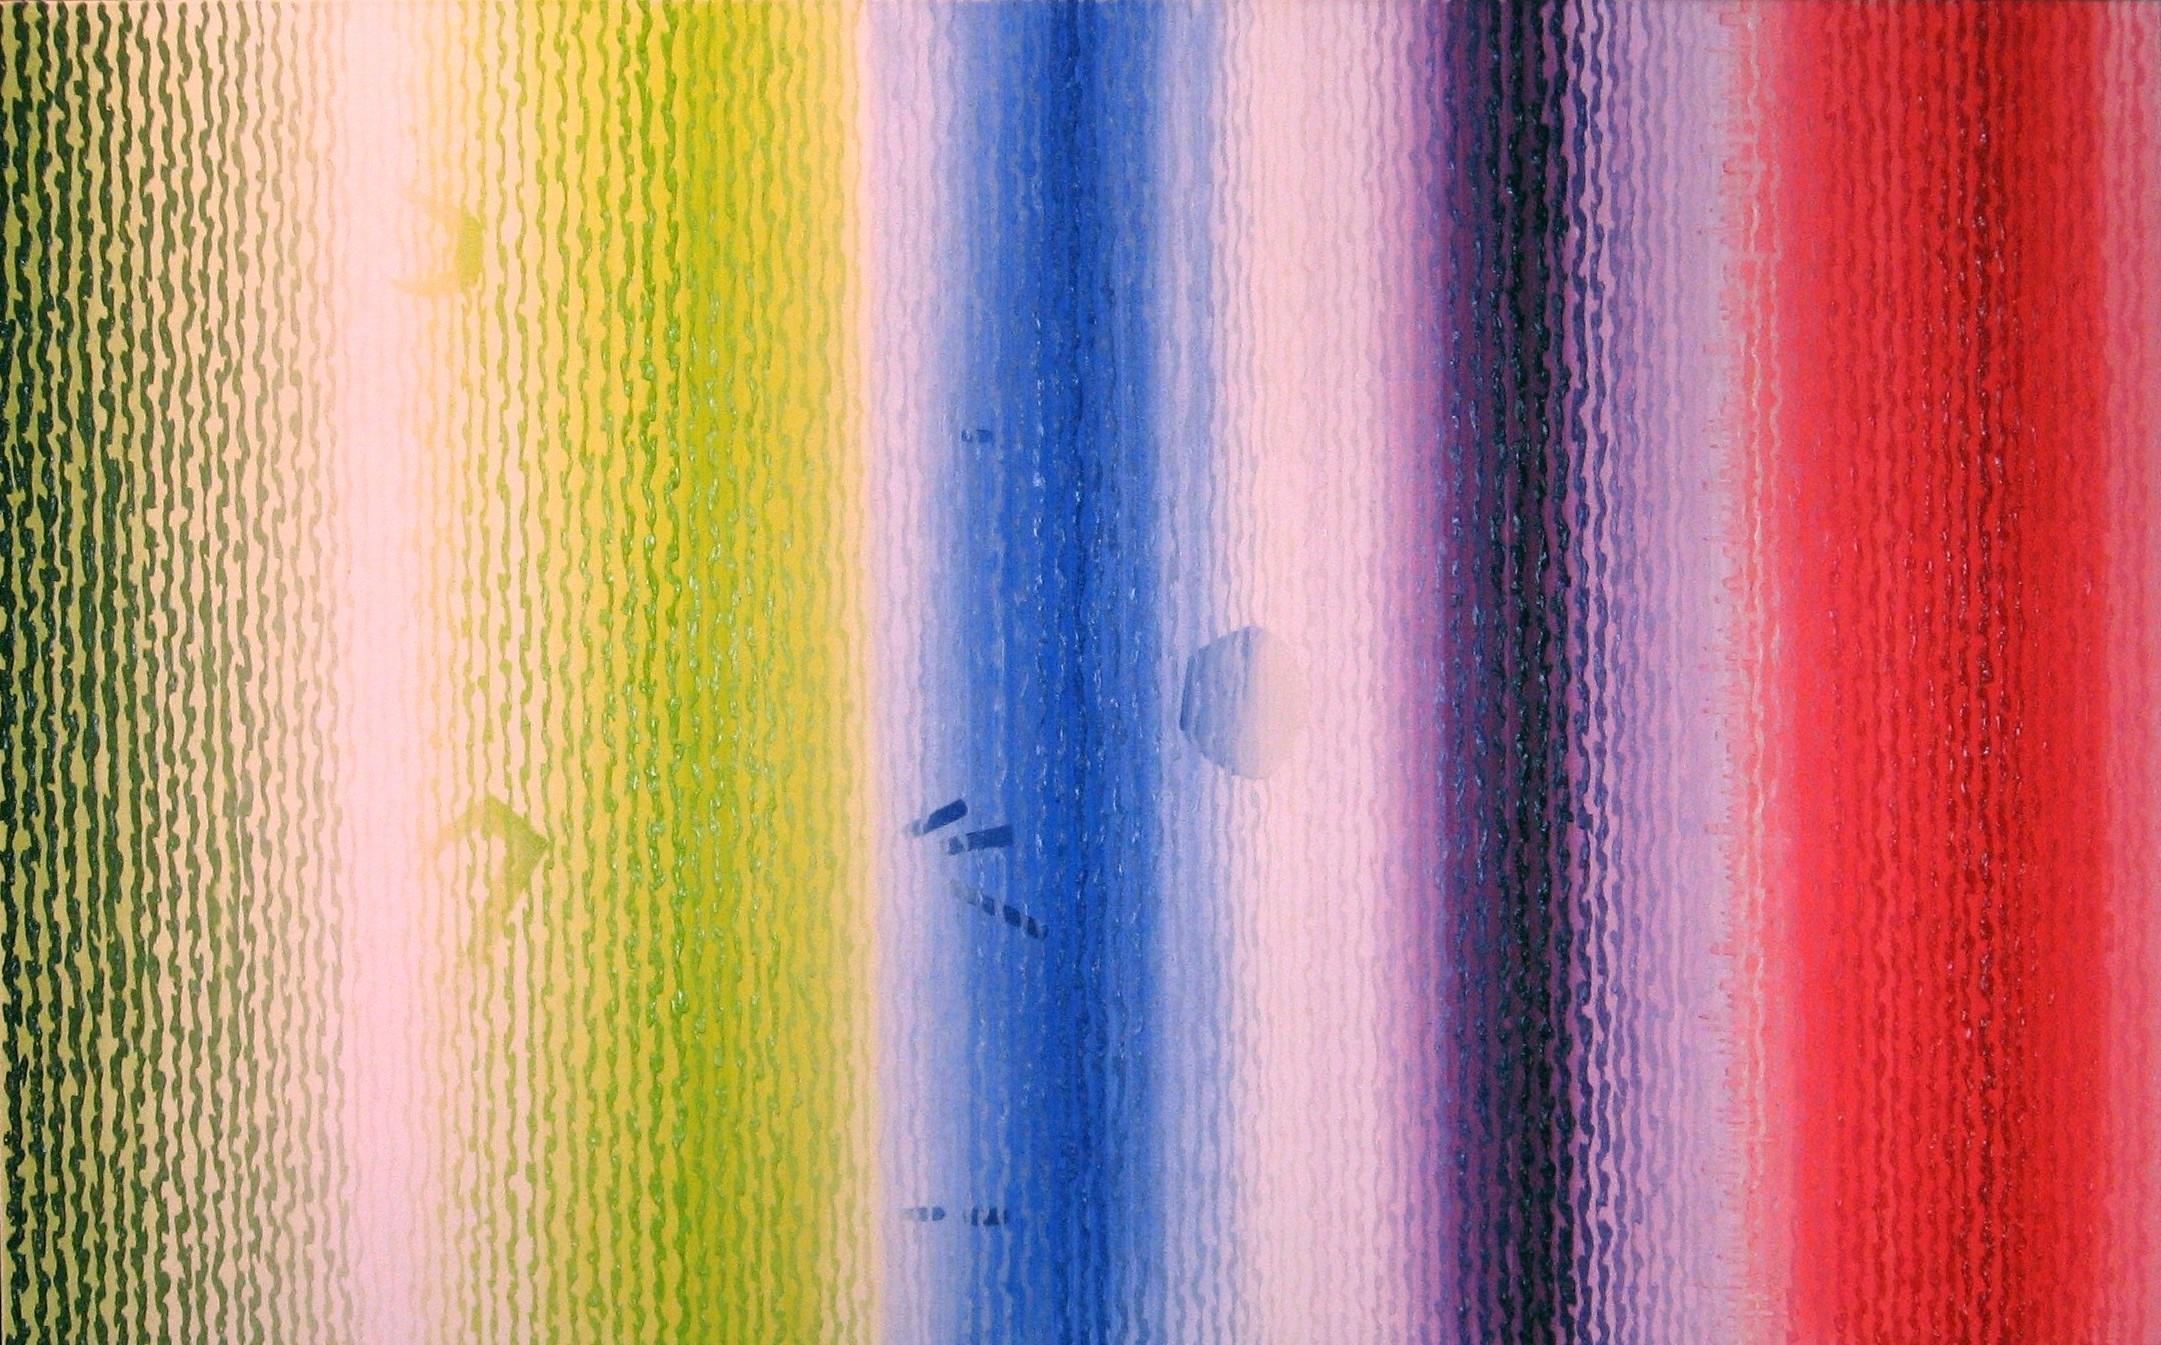 Jurgen Tarrasch, Sequences, 2007-2008, oil on canvas, 50x80 in..JPG